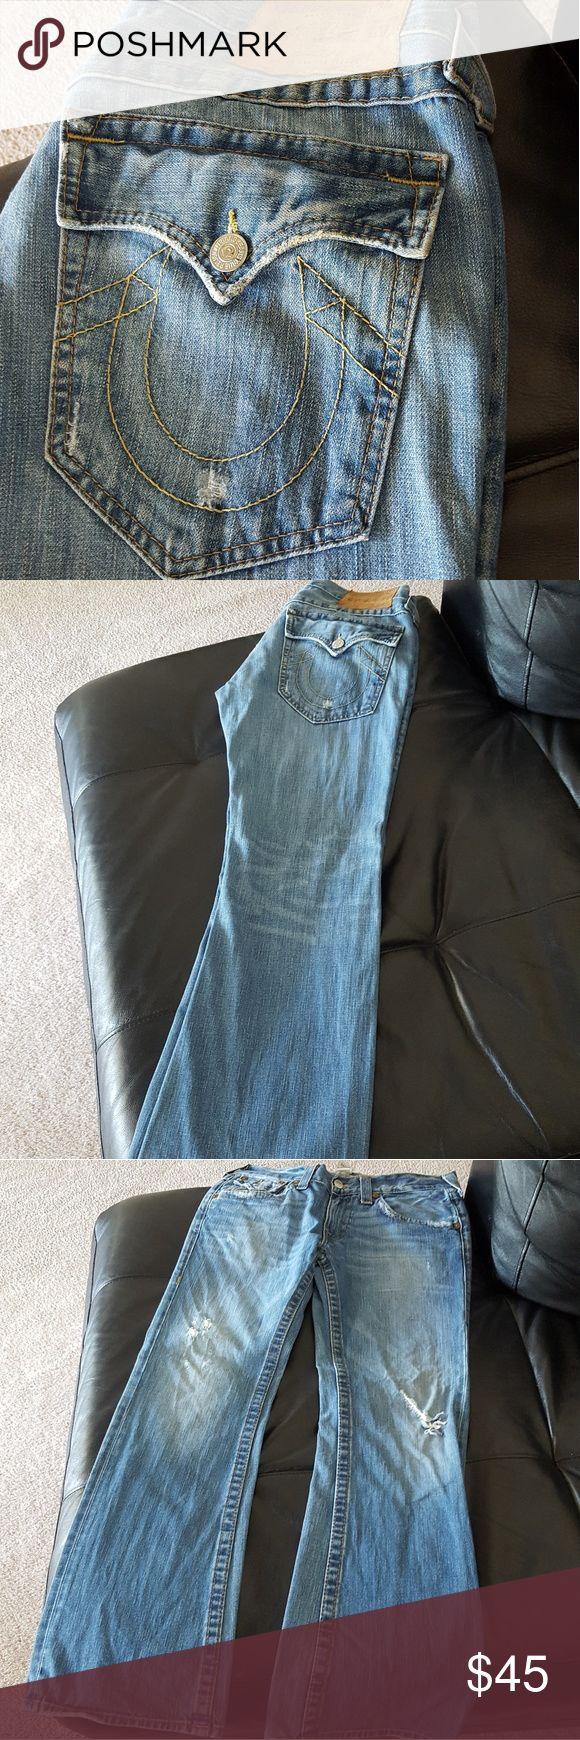 Men's True Religion Jeans Light denim True Religion Jeans Straight